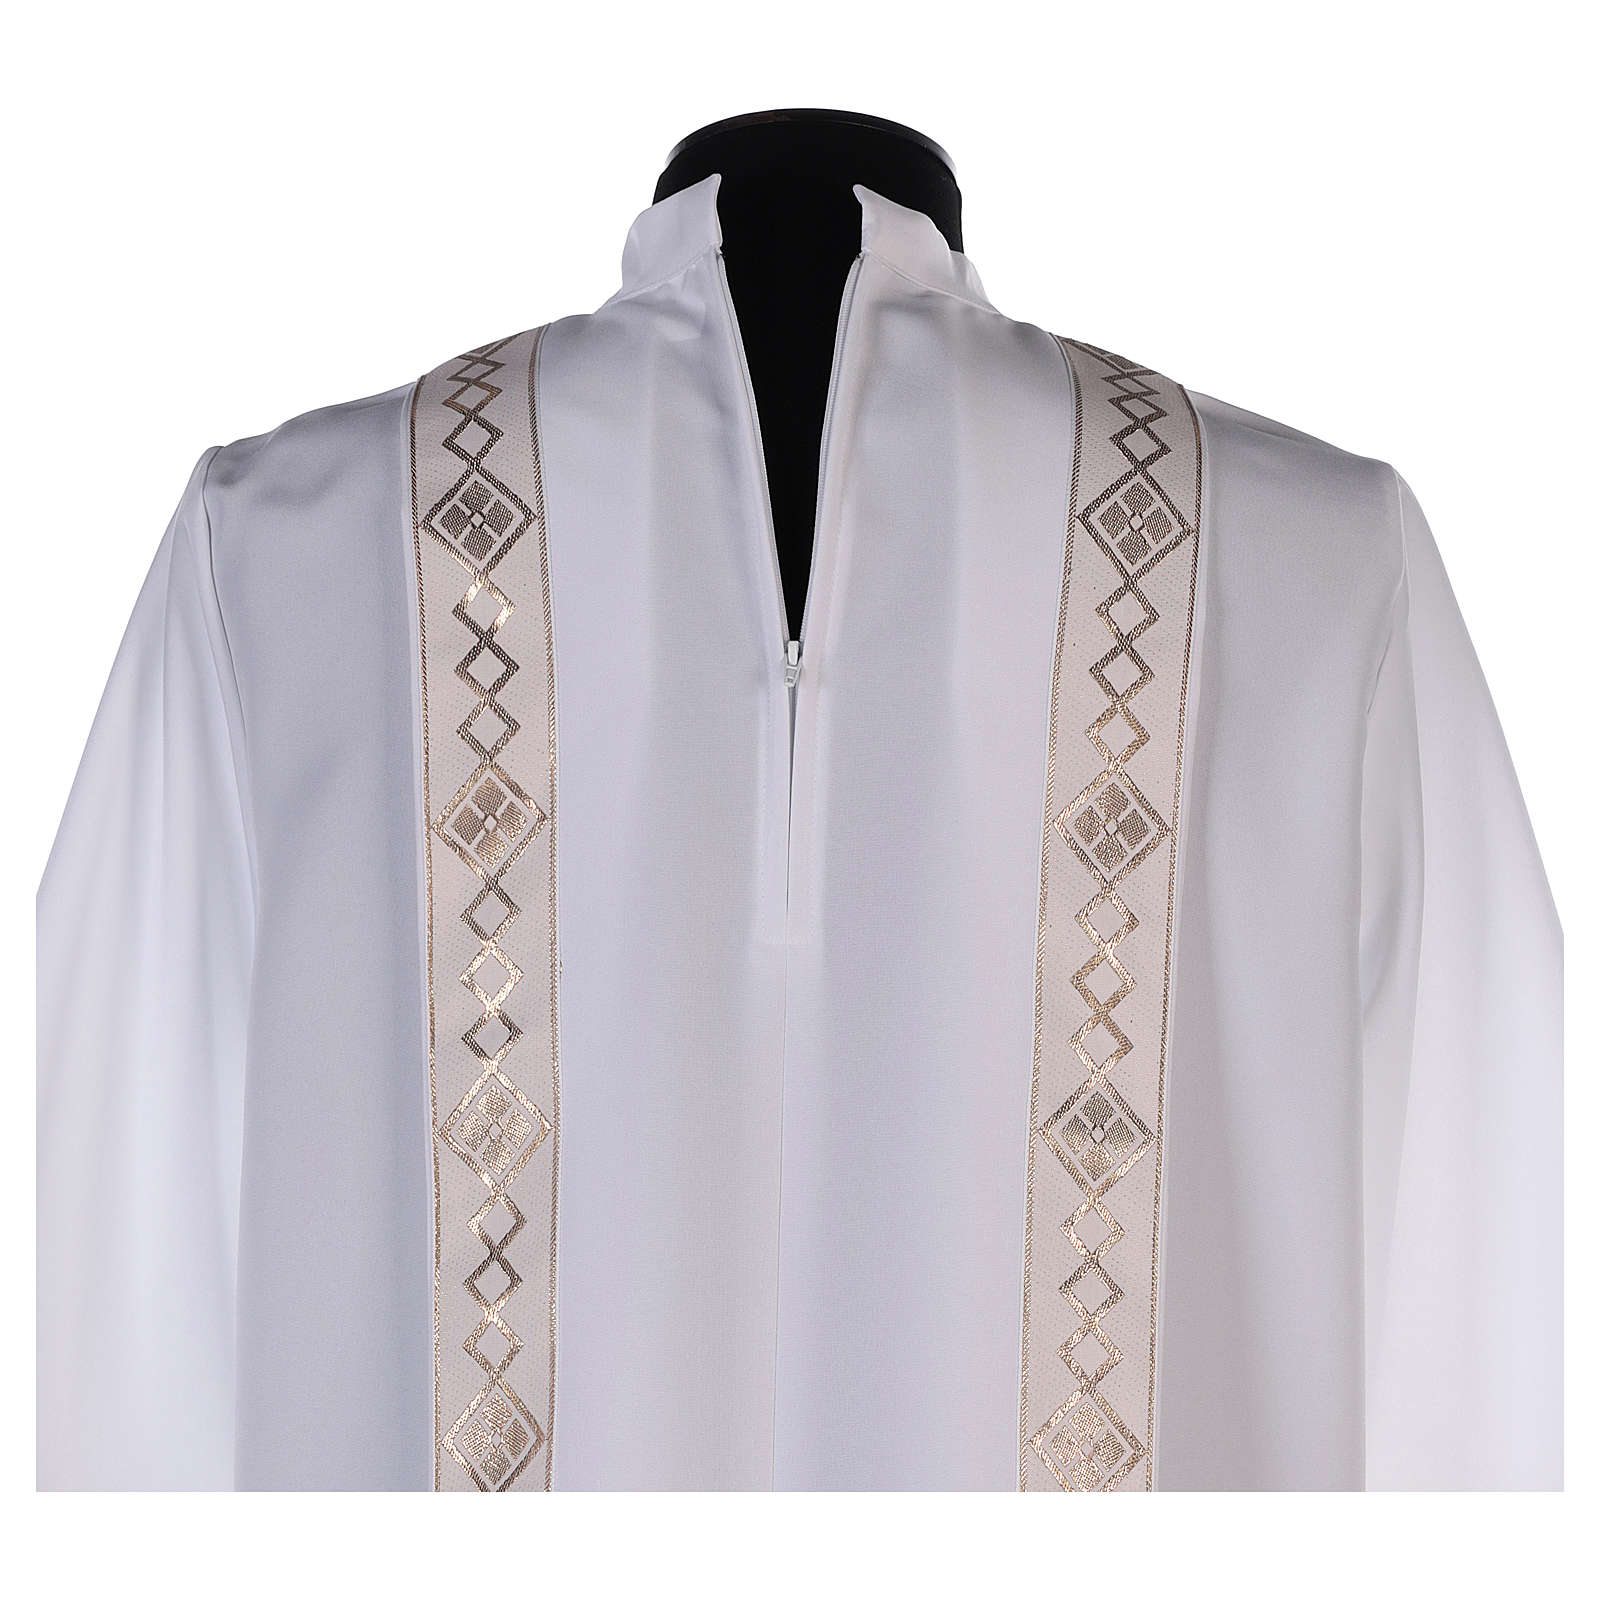 Aube Première Communion bord or col montant 4